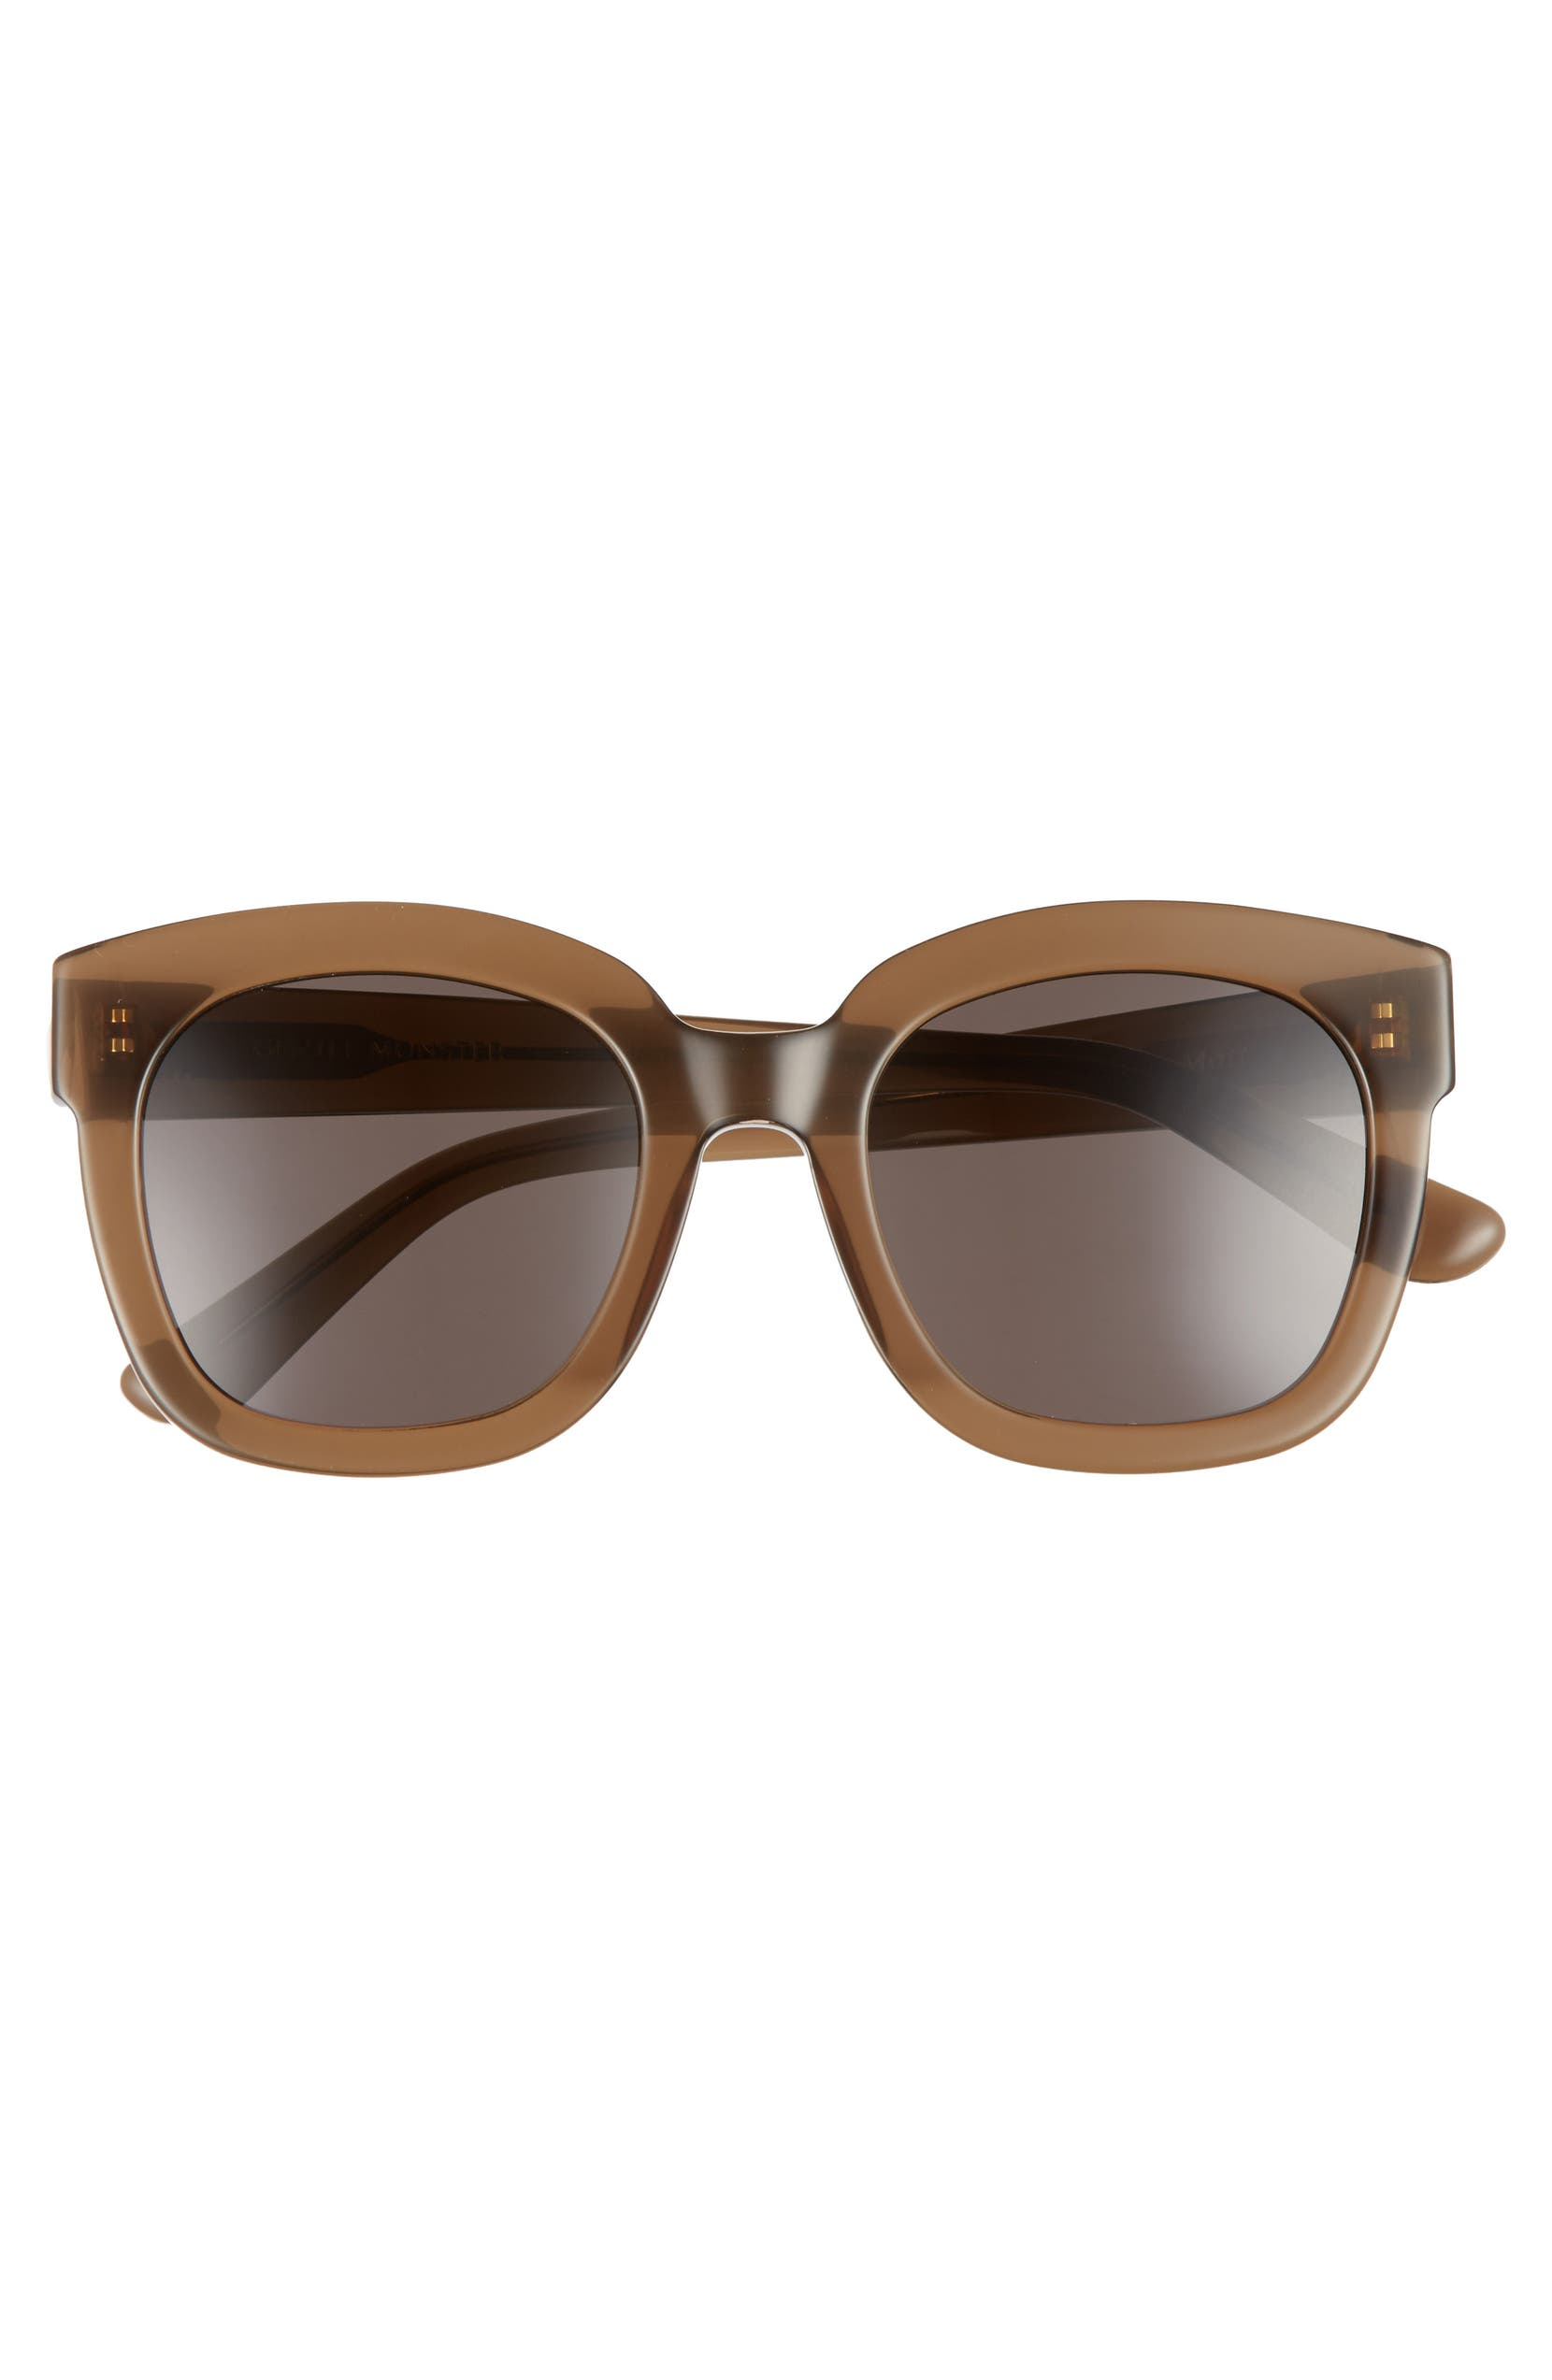 526ba598e6a6 Gentle Monster Matti 51mm Rounded Sunglasses